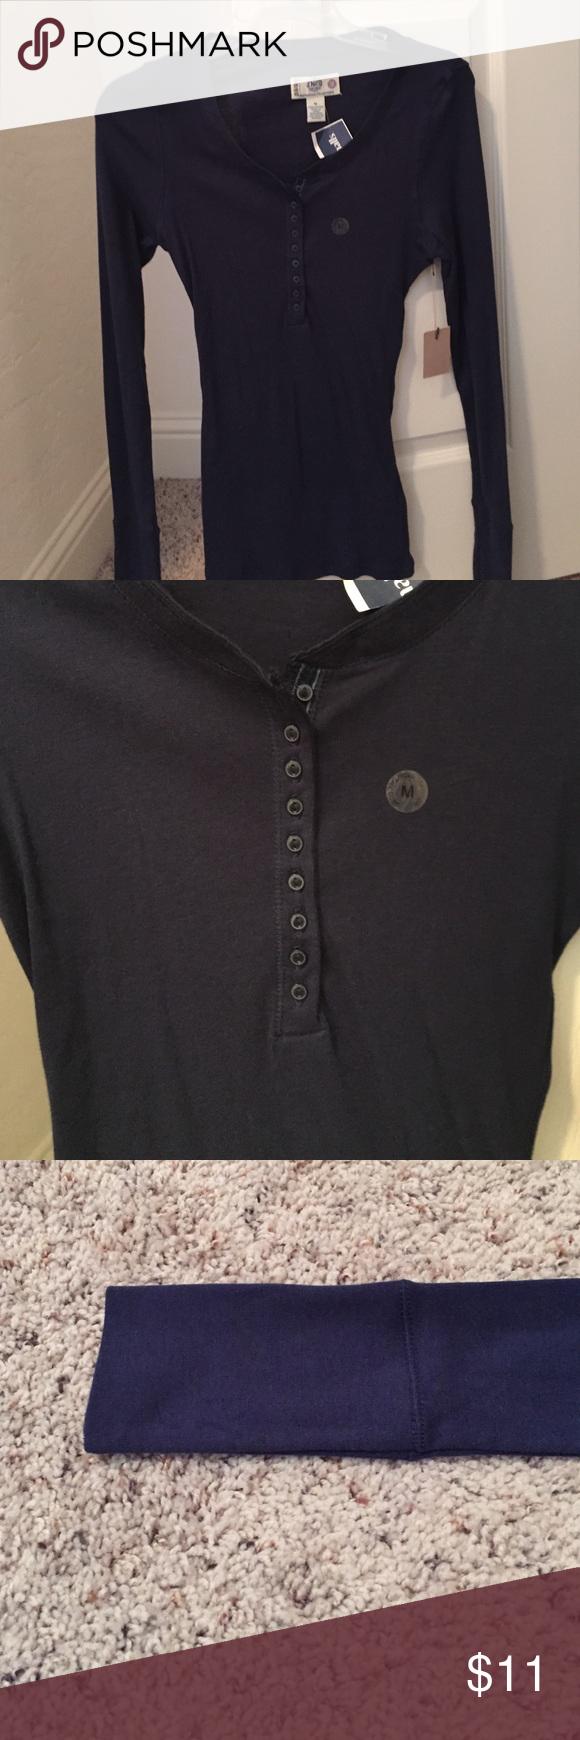 Navy Long Sleeve Shirt NWT Navy Blue Long Sleeve Top. JNCO Tops